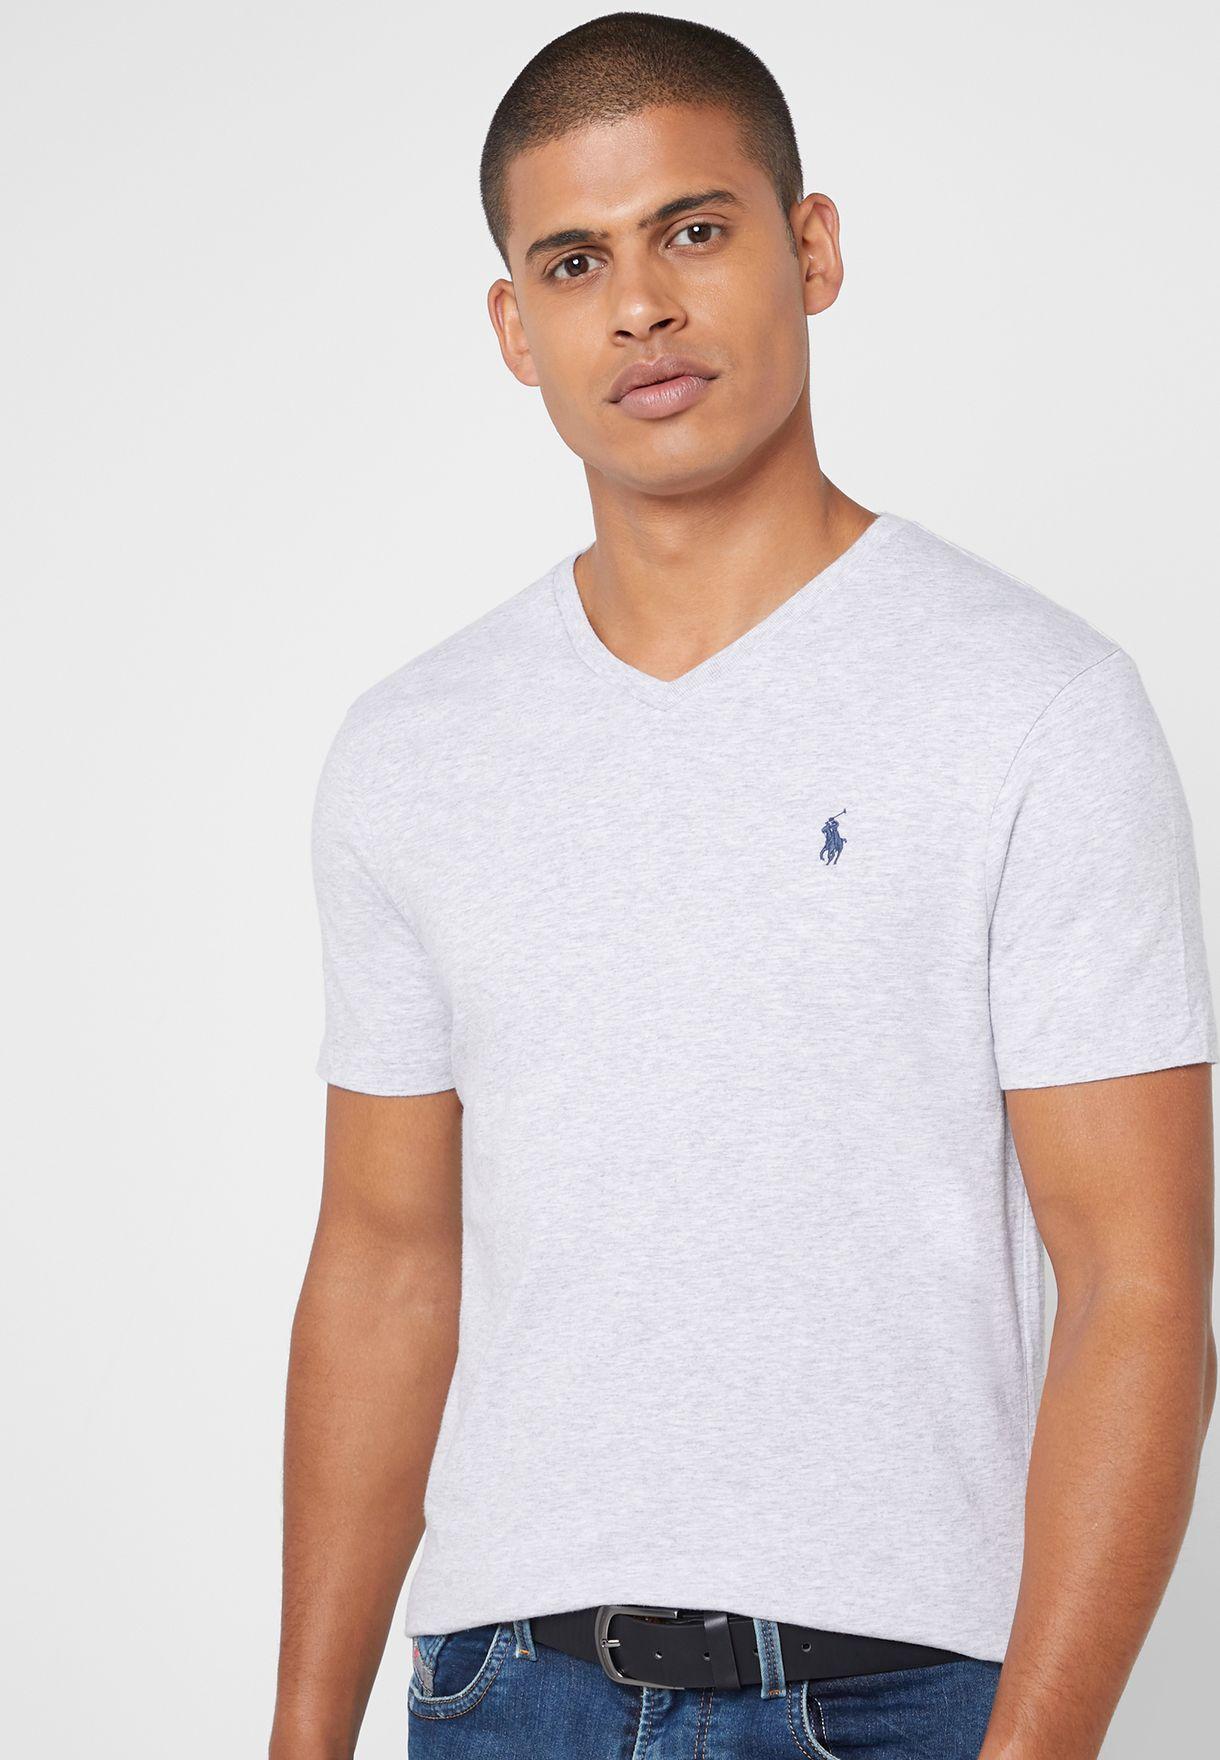 5acefeb5a6a96b Shop Polo Ralph Lauren grey Custom Slim Fit Cotton T-Shirt ...